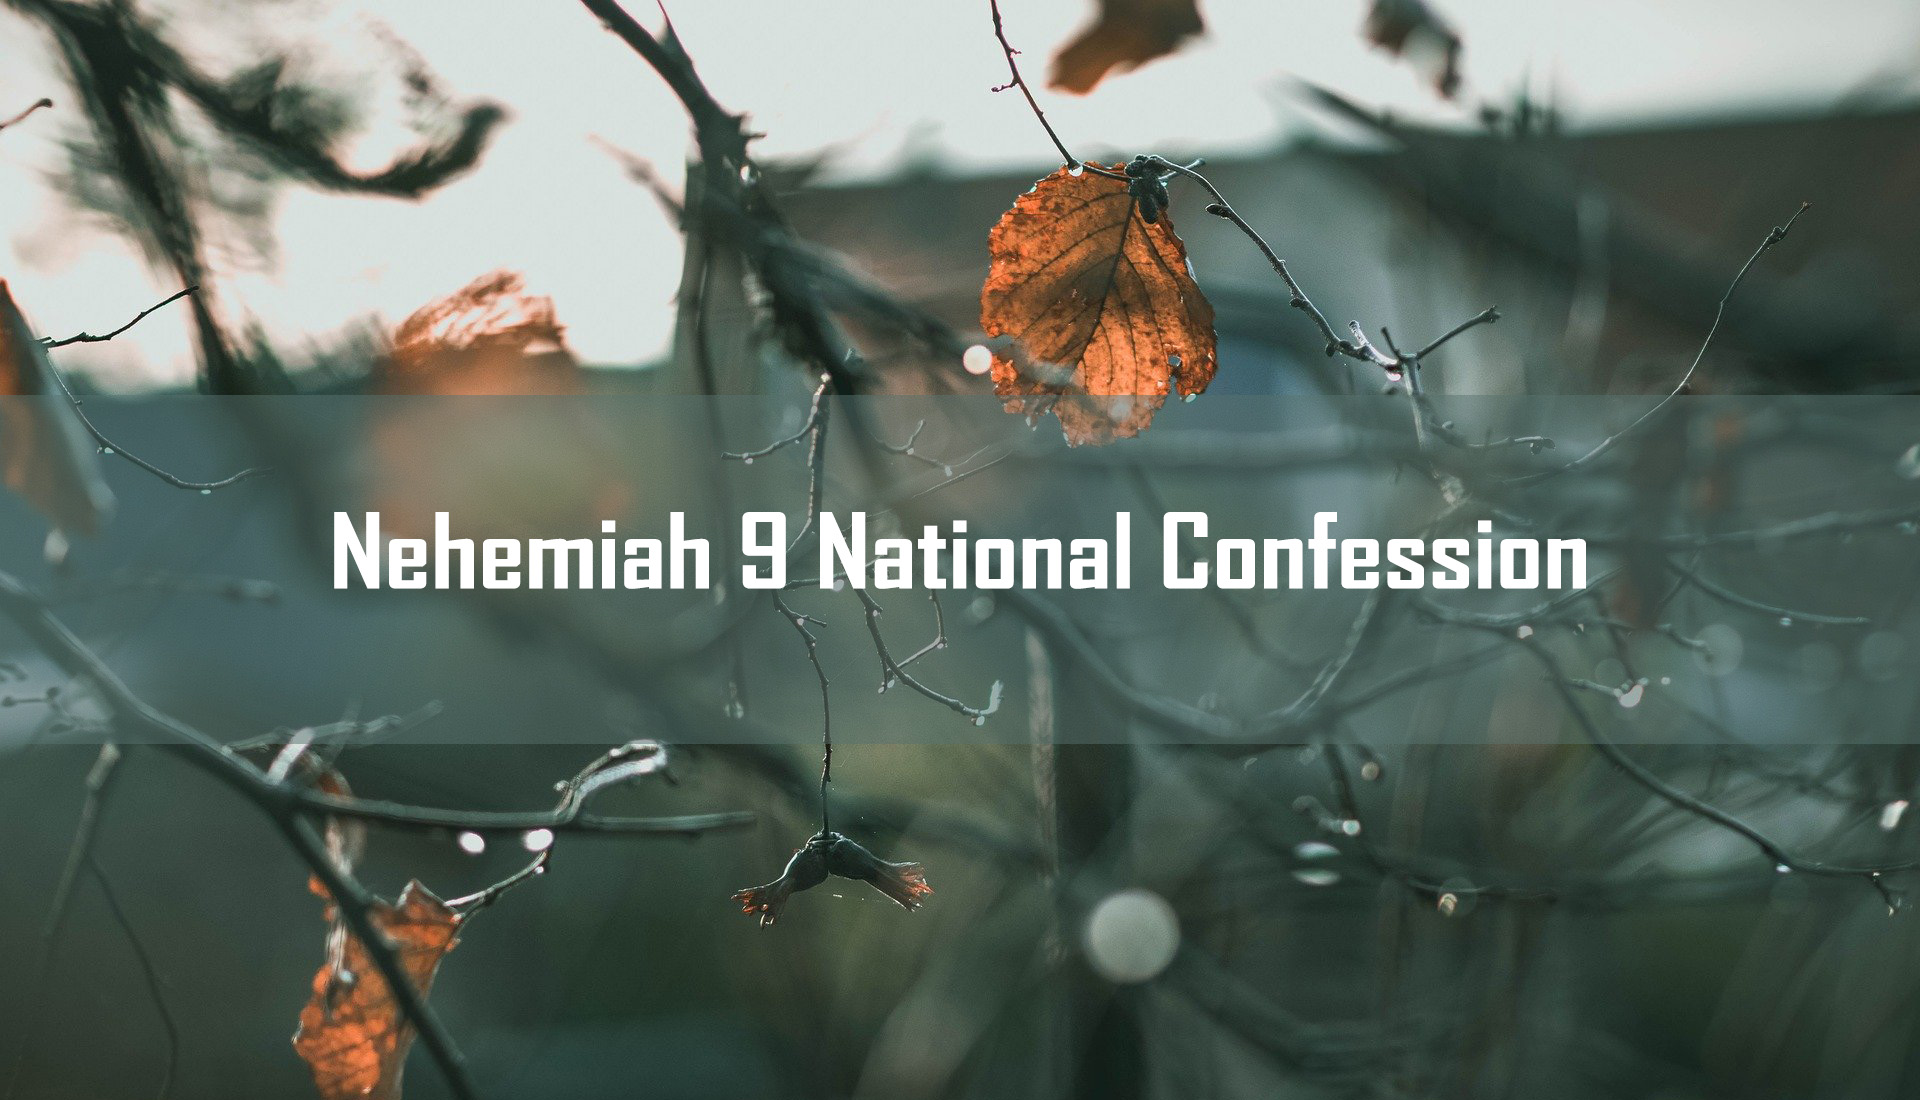 Nehemiah 9 National Confession <br/> Vinod Samuel